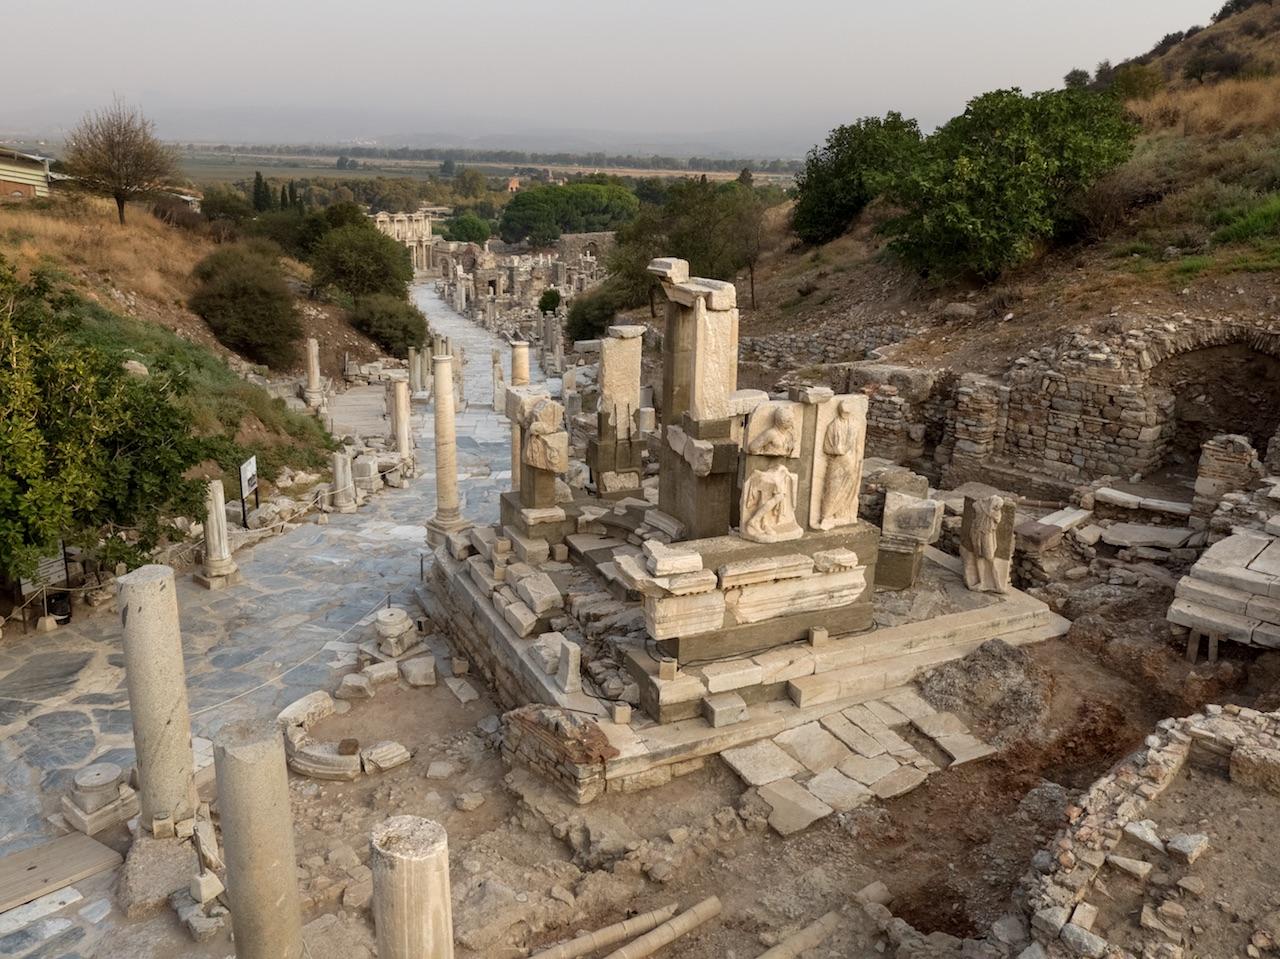 Memmius anıtı (© ÖAW-ÖAI, N. Gail)